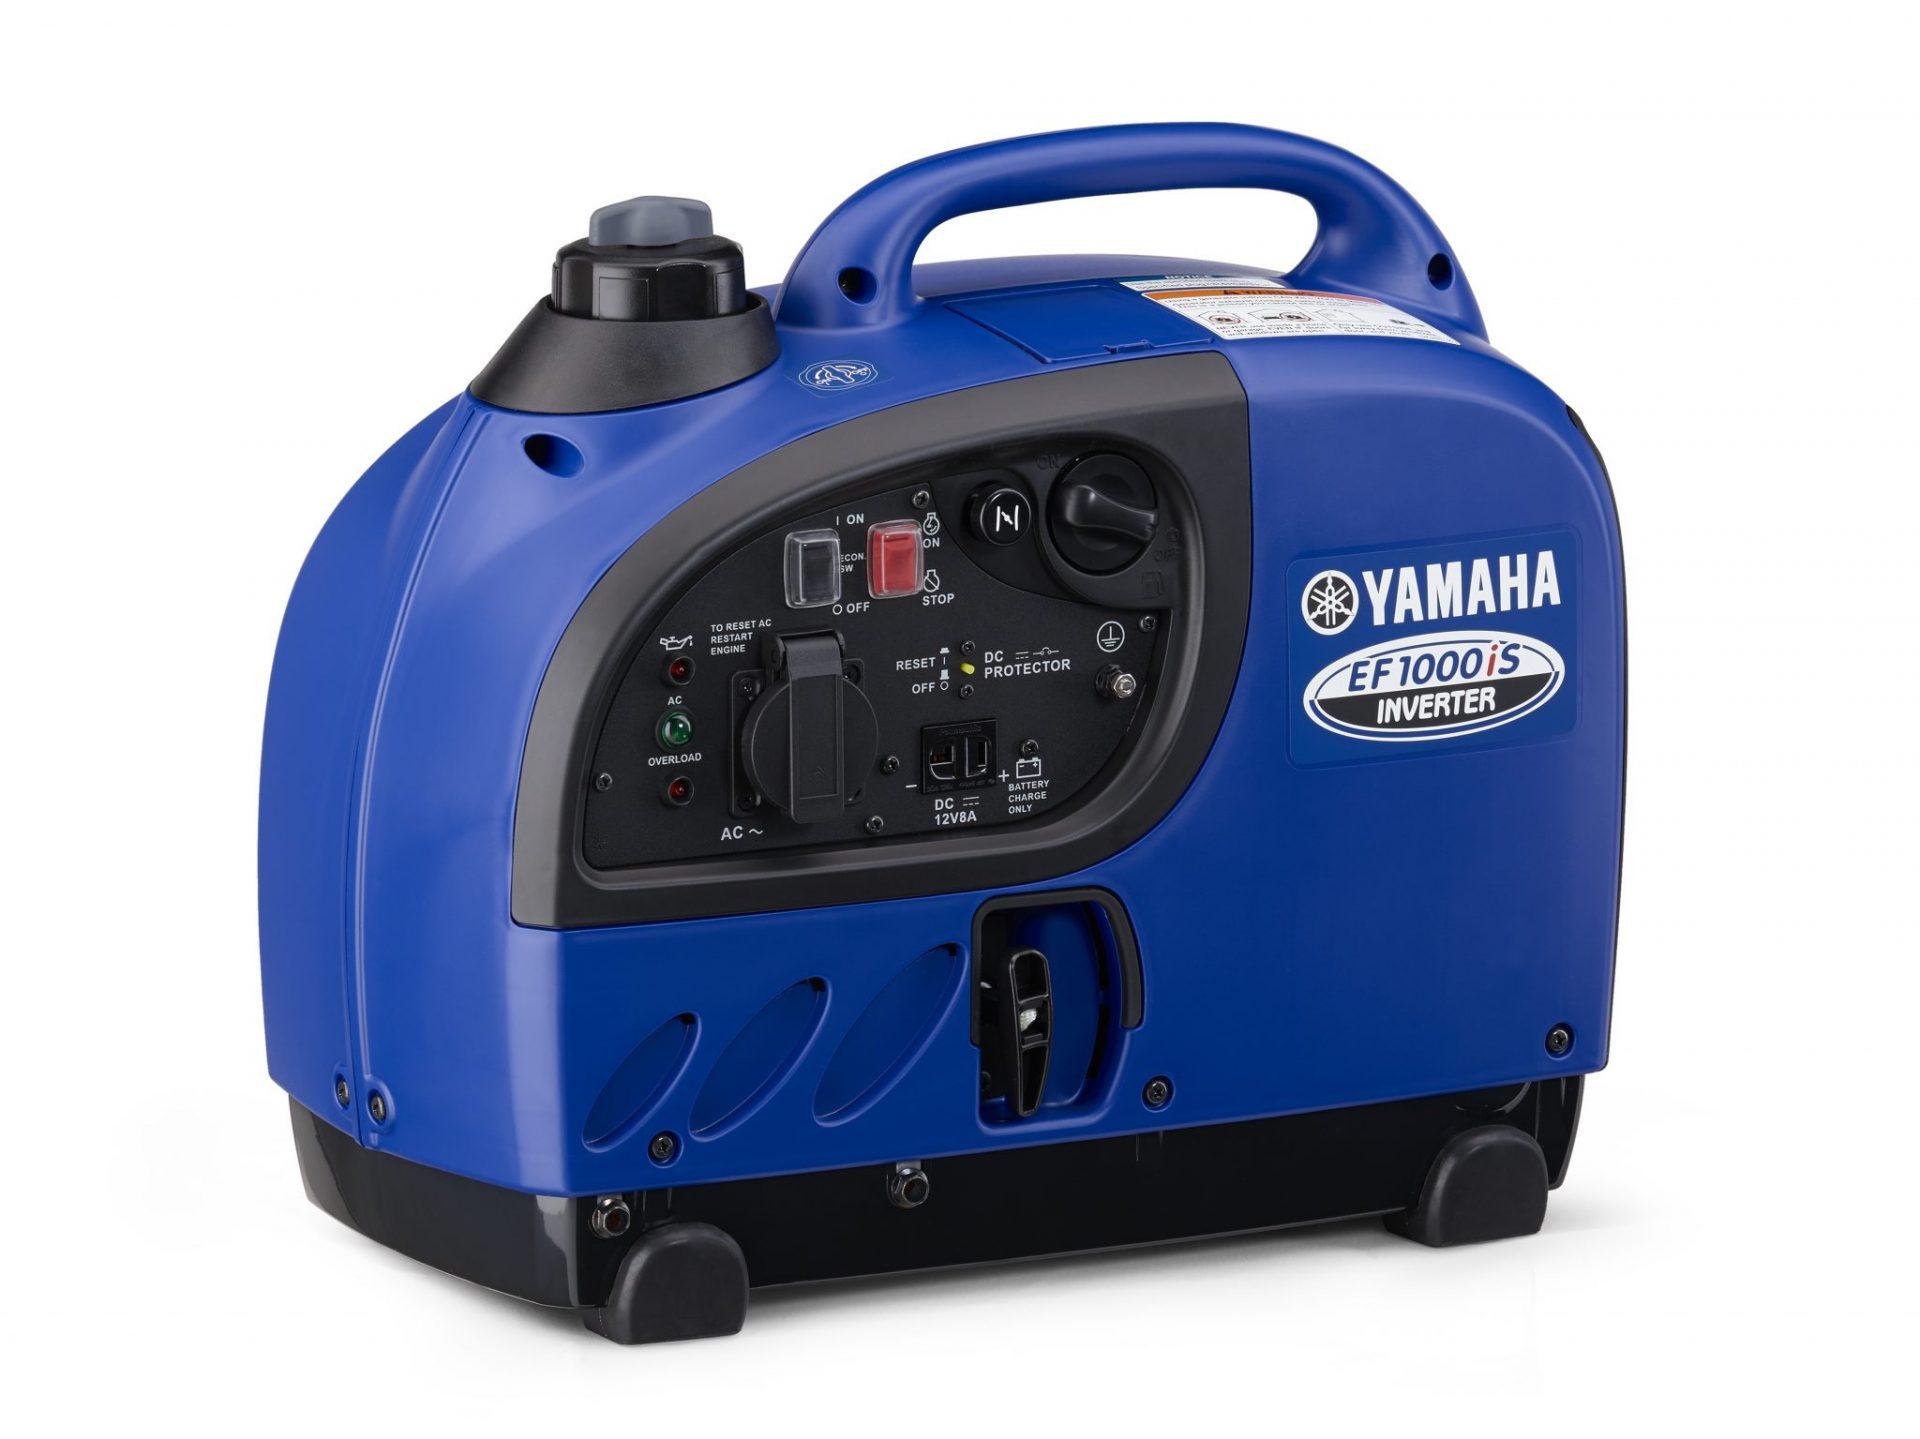 Yamaha EF1000iS 1 kVA inverter generator